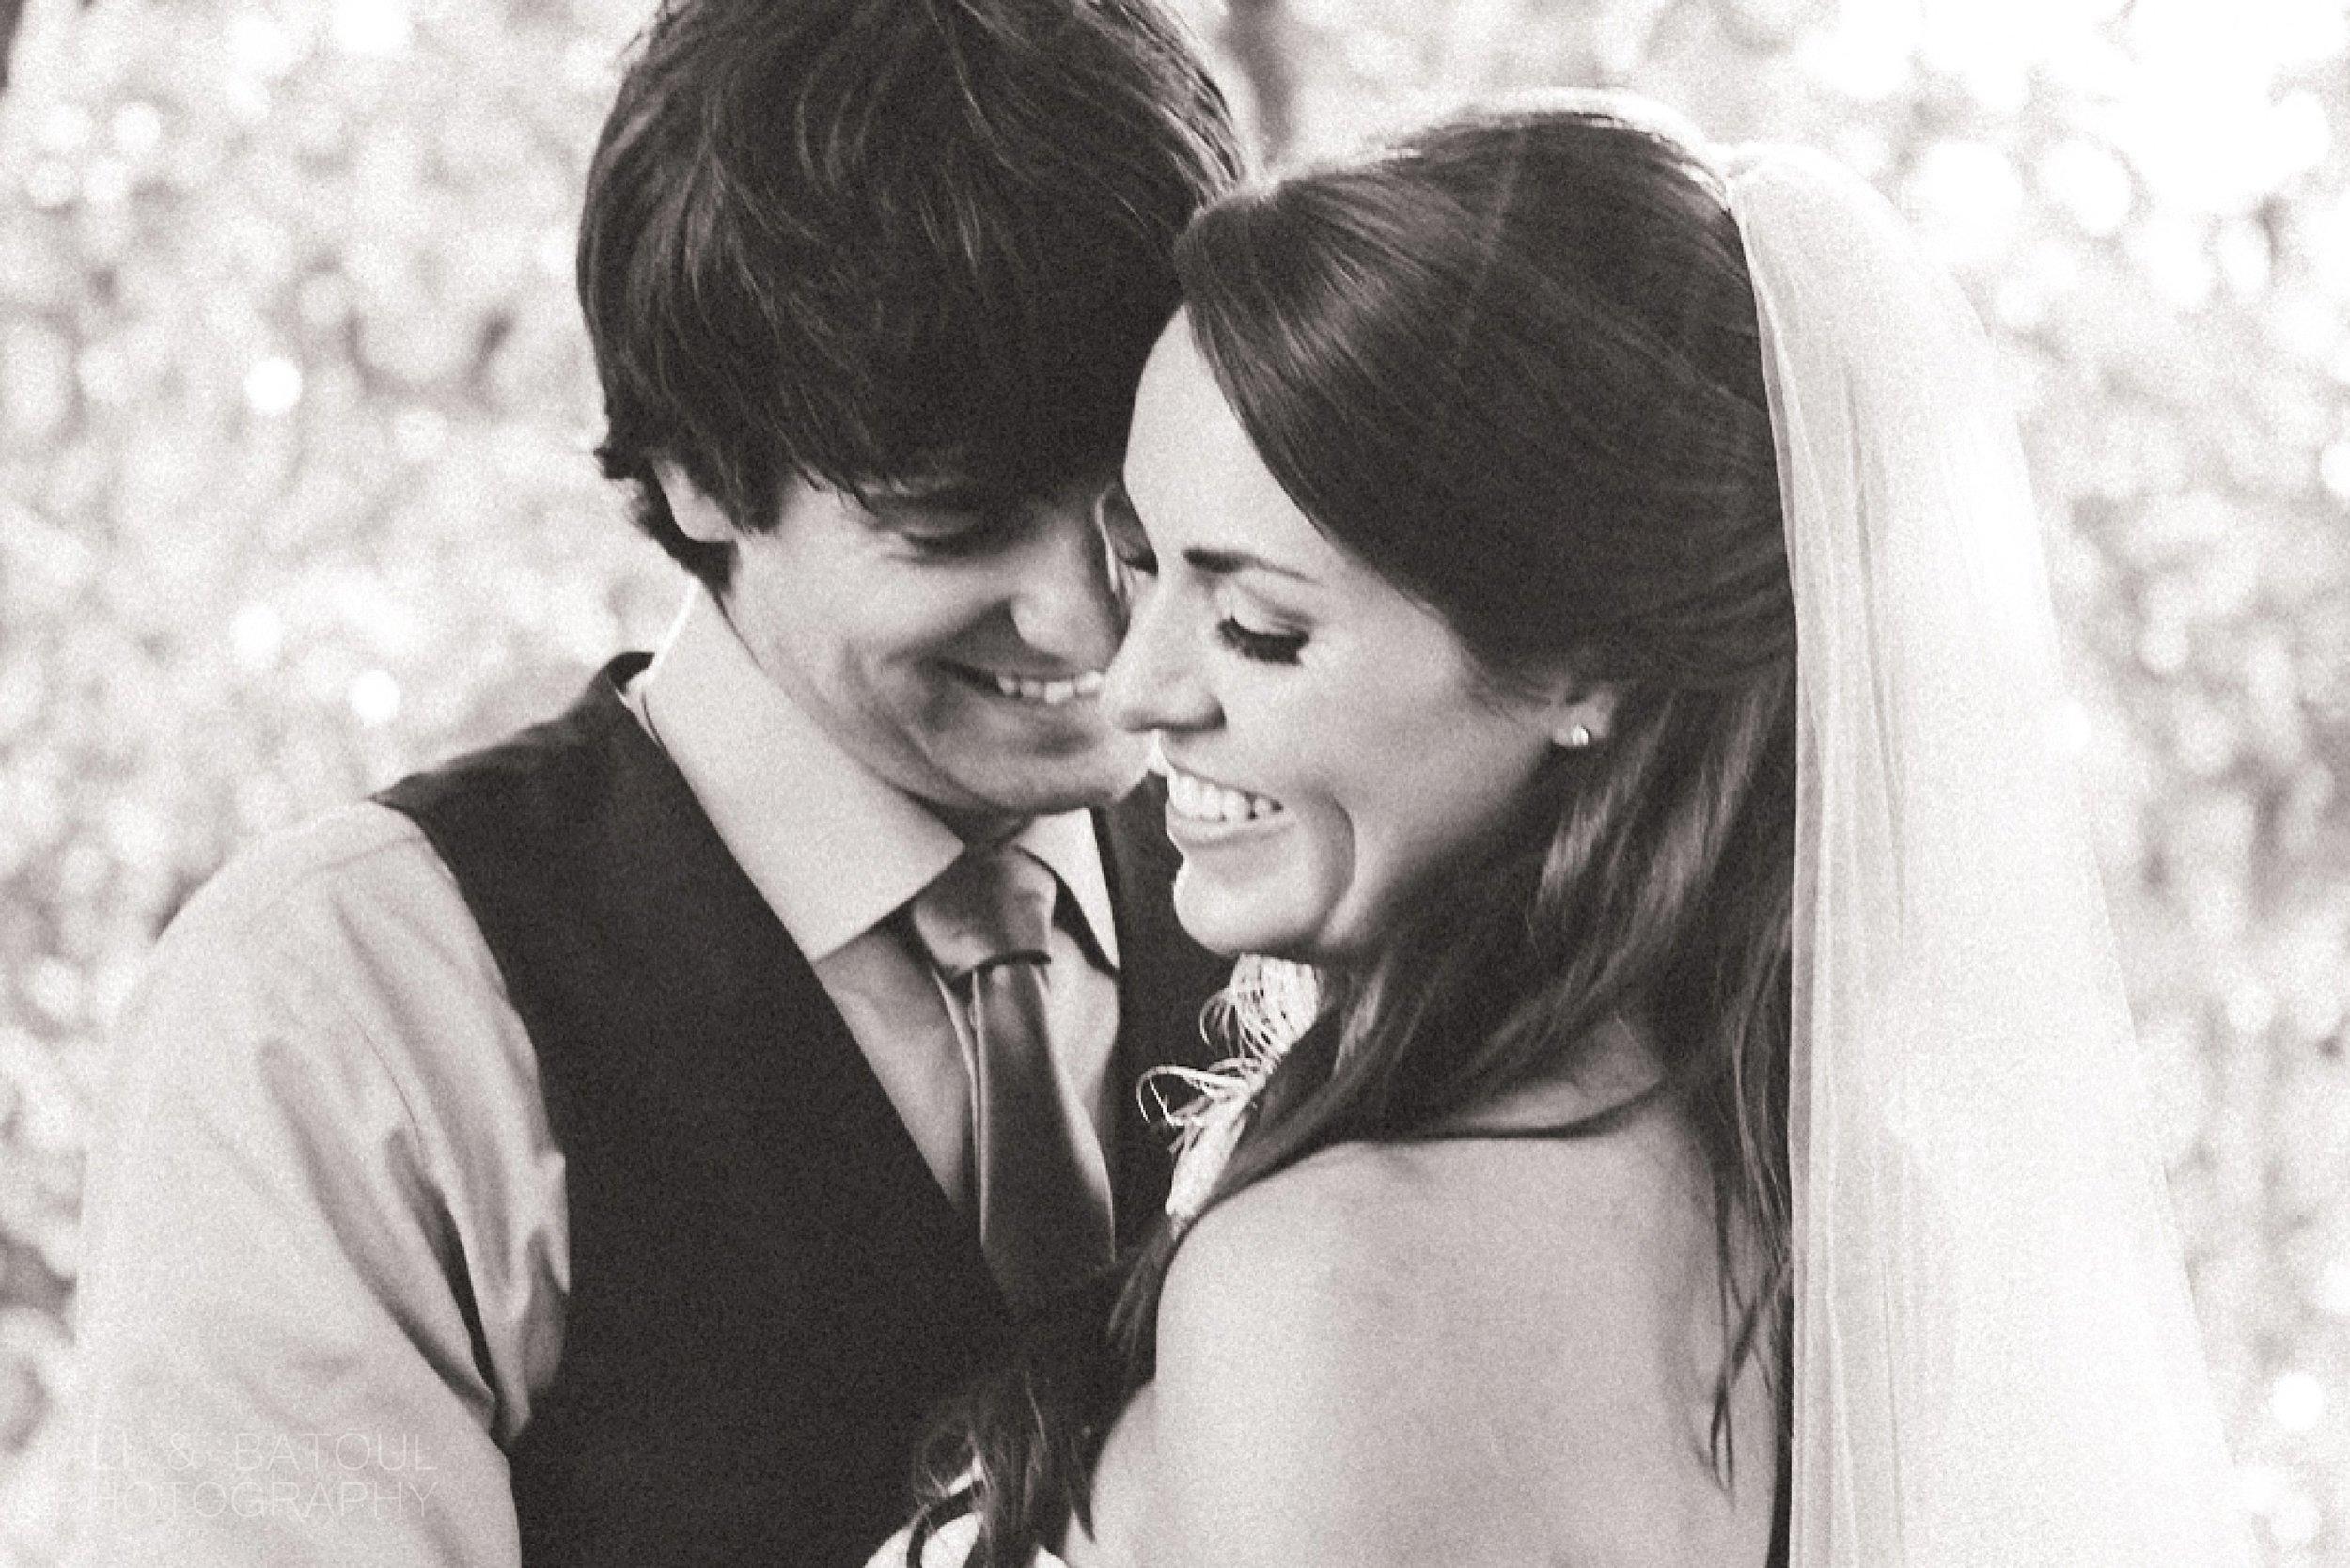 Ali & Batoul Photography - Documentary Fine Art Ottawa Wedding Photography_0066.jpg